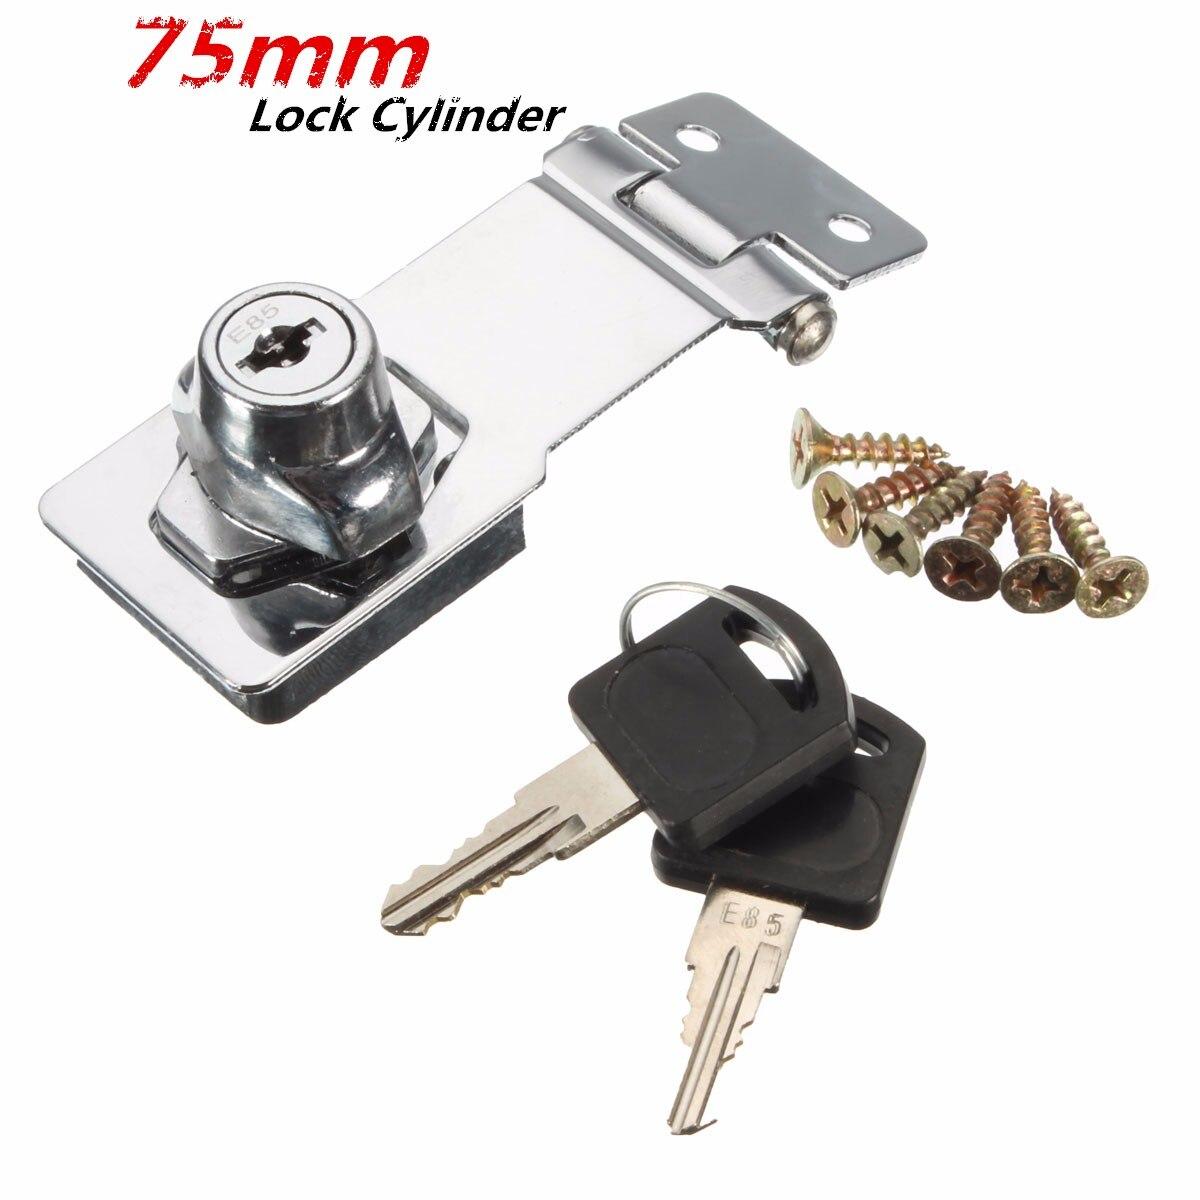 MTGATHER 75mm Stainless Steel Plating Self Locking Security Hasp Staple 2 Keys Lock Shed Cupboard Padlock